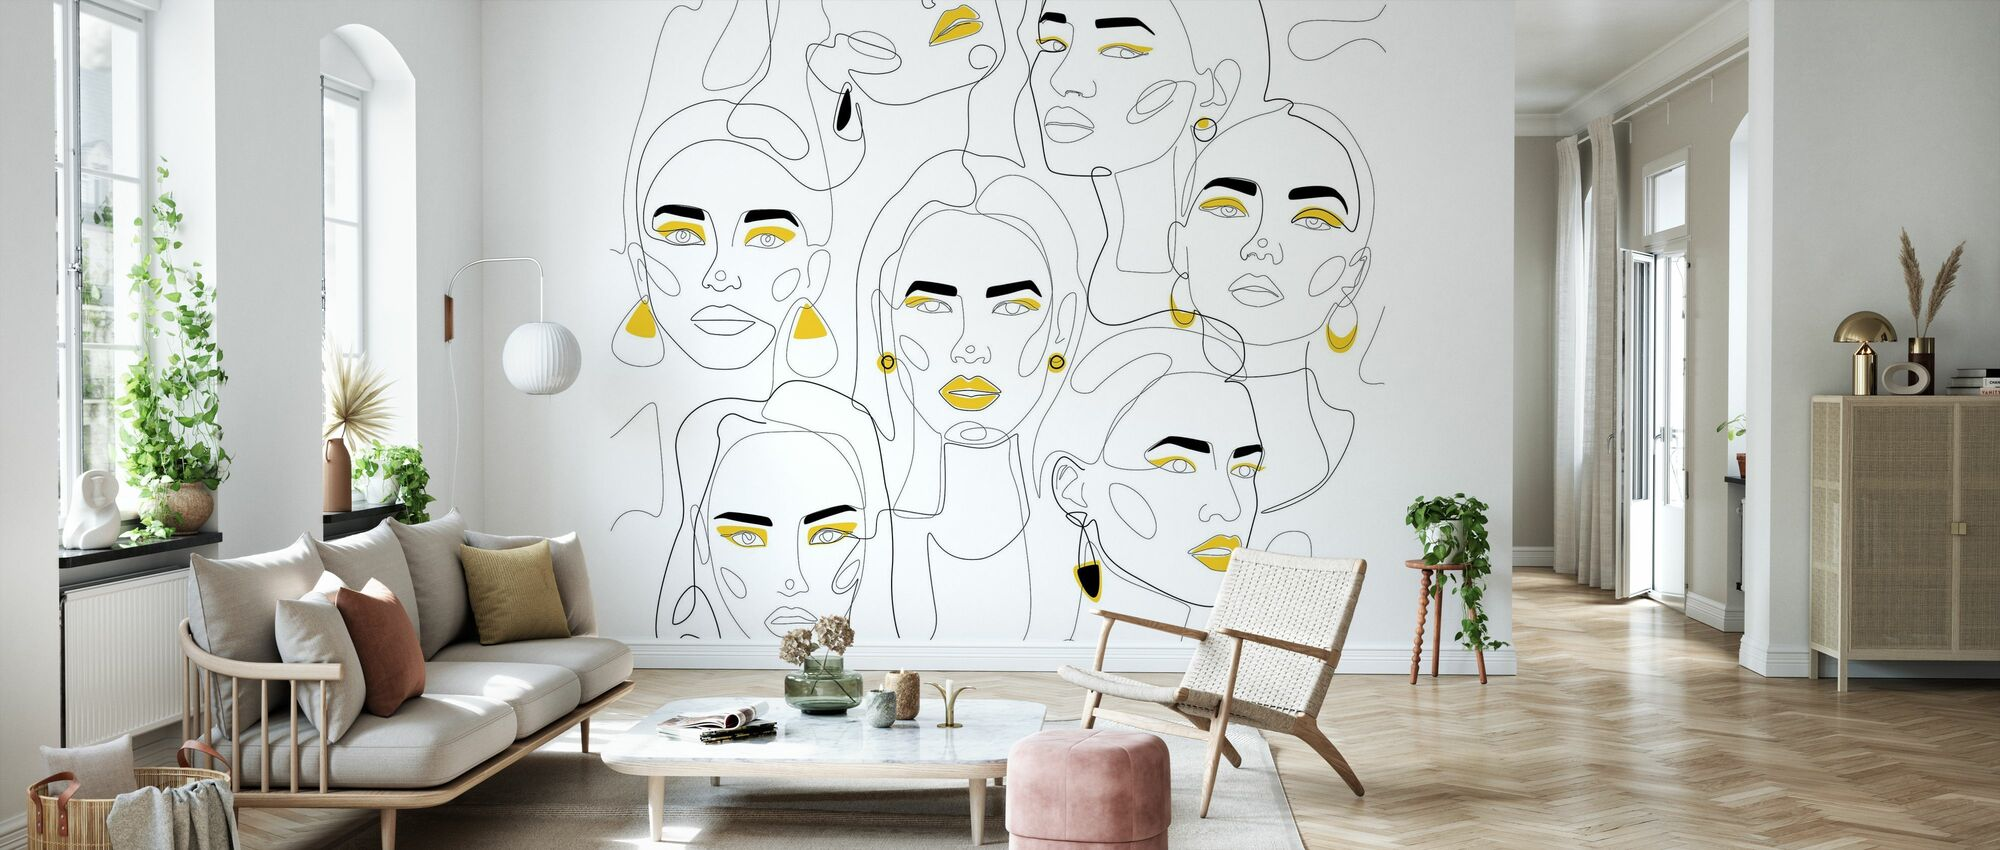 In Mustard II - Wallpaper - Living Room